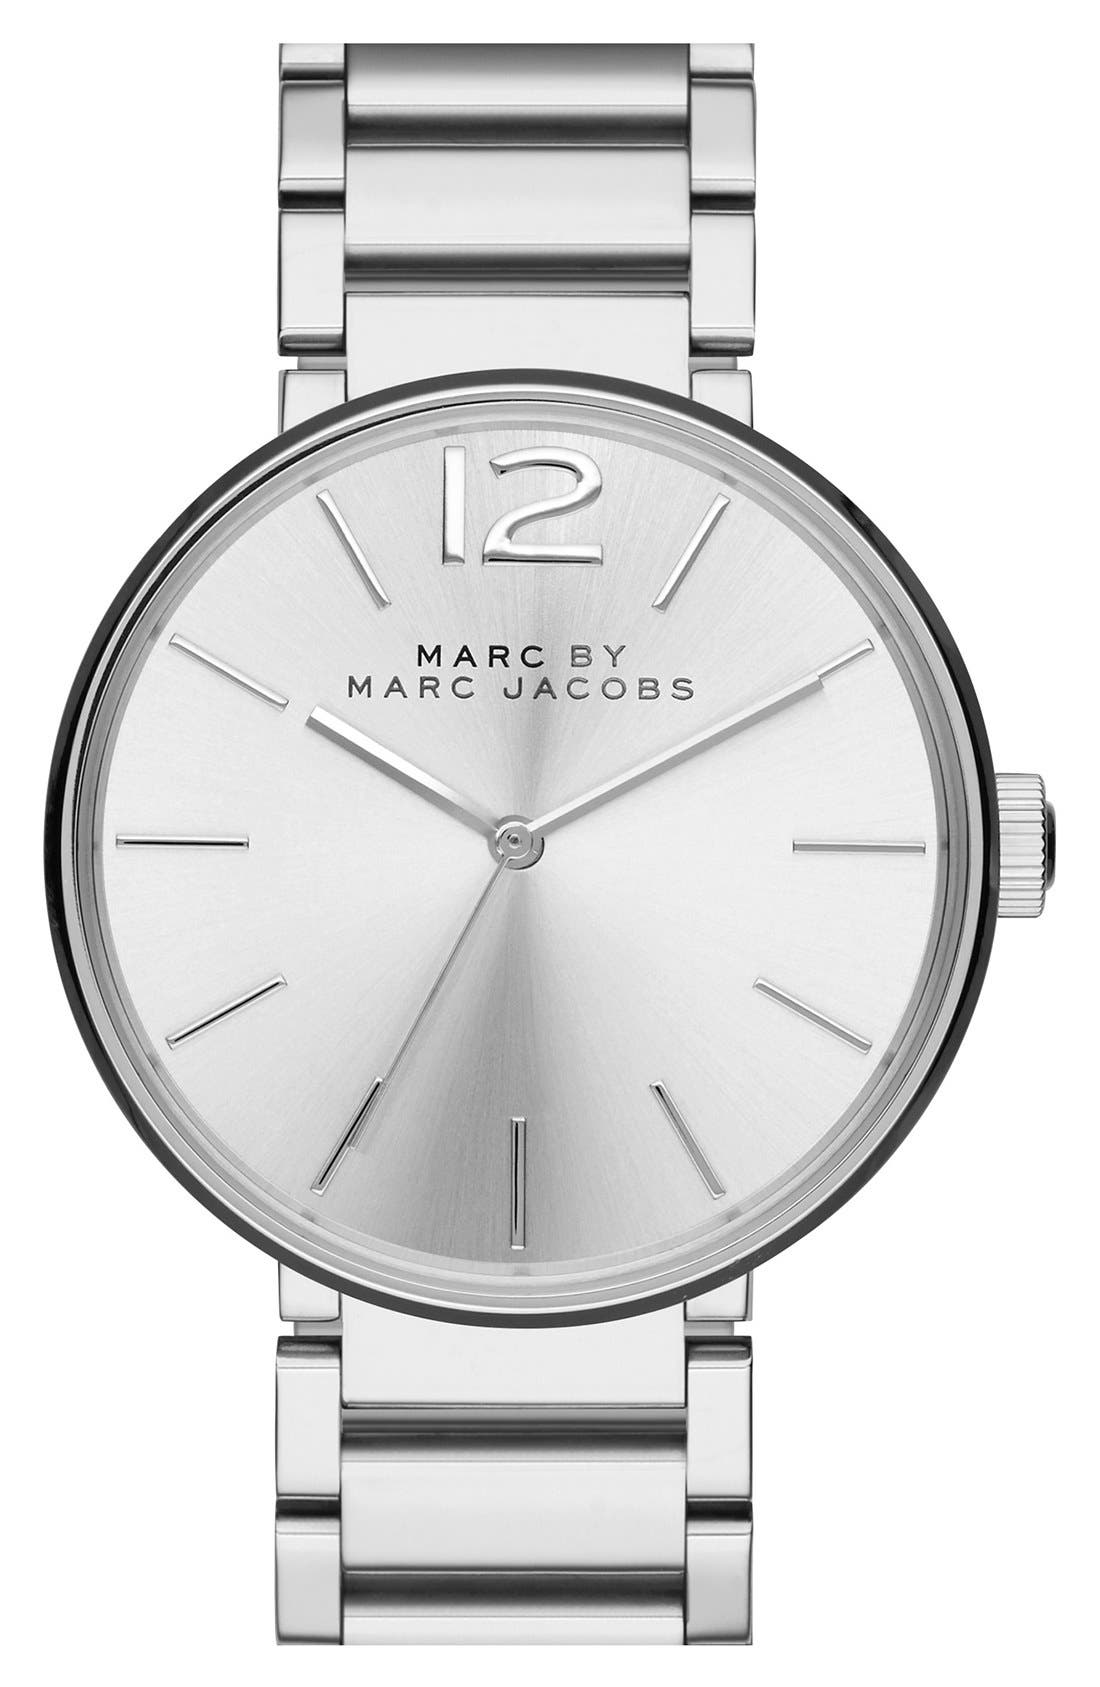 Main Image - MARC JACOBS 'Peggy' Bracelet Watch, 36mm